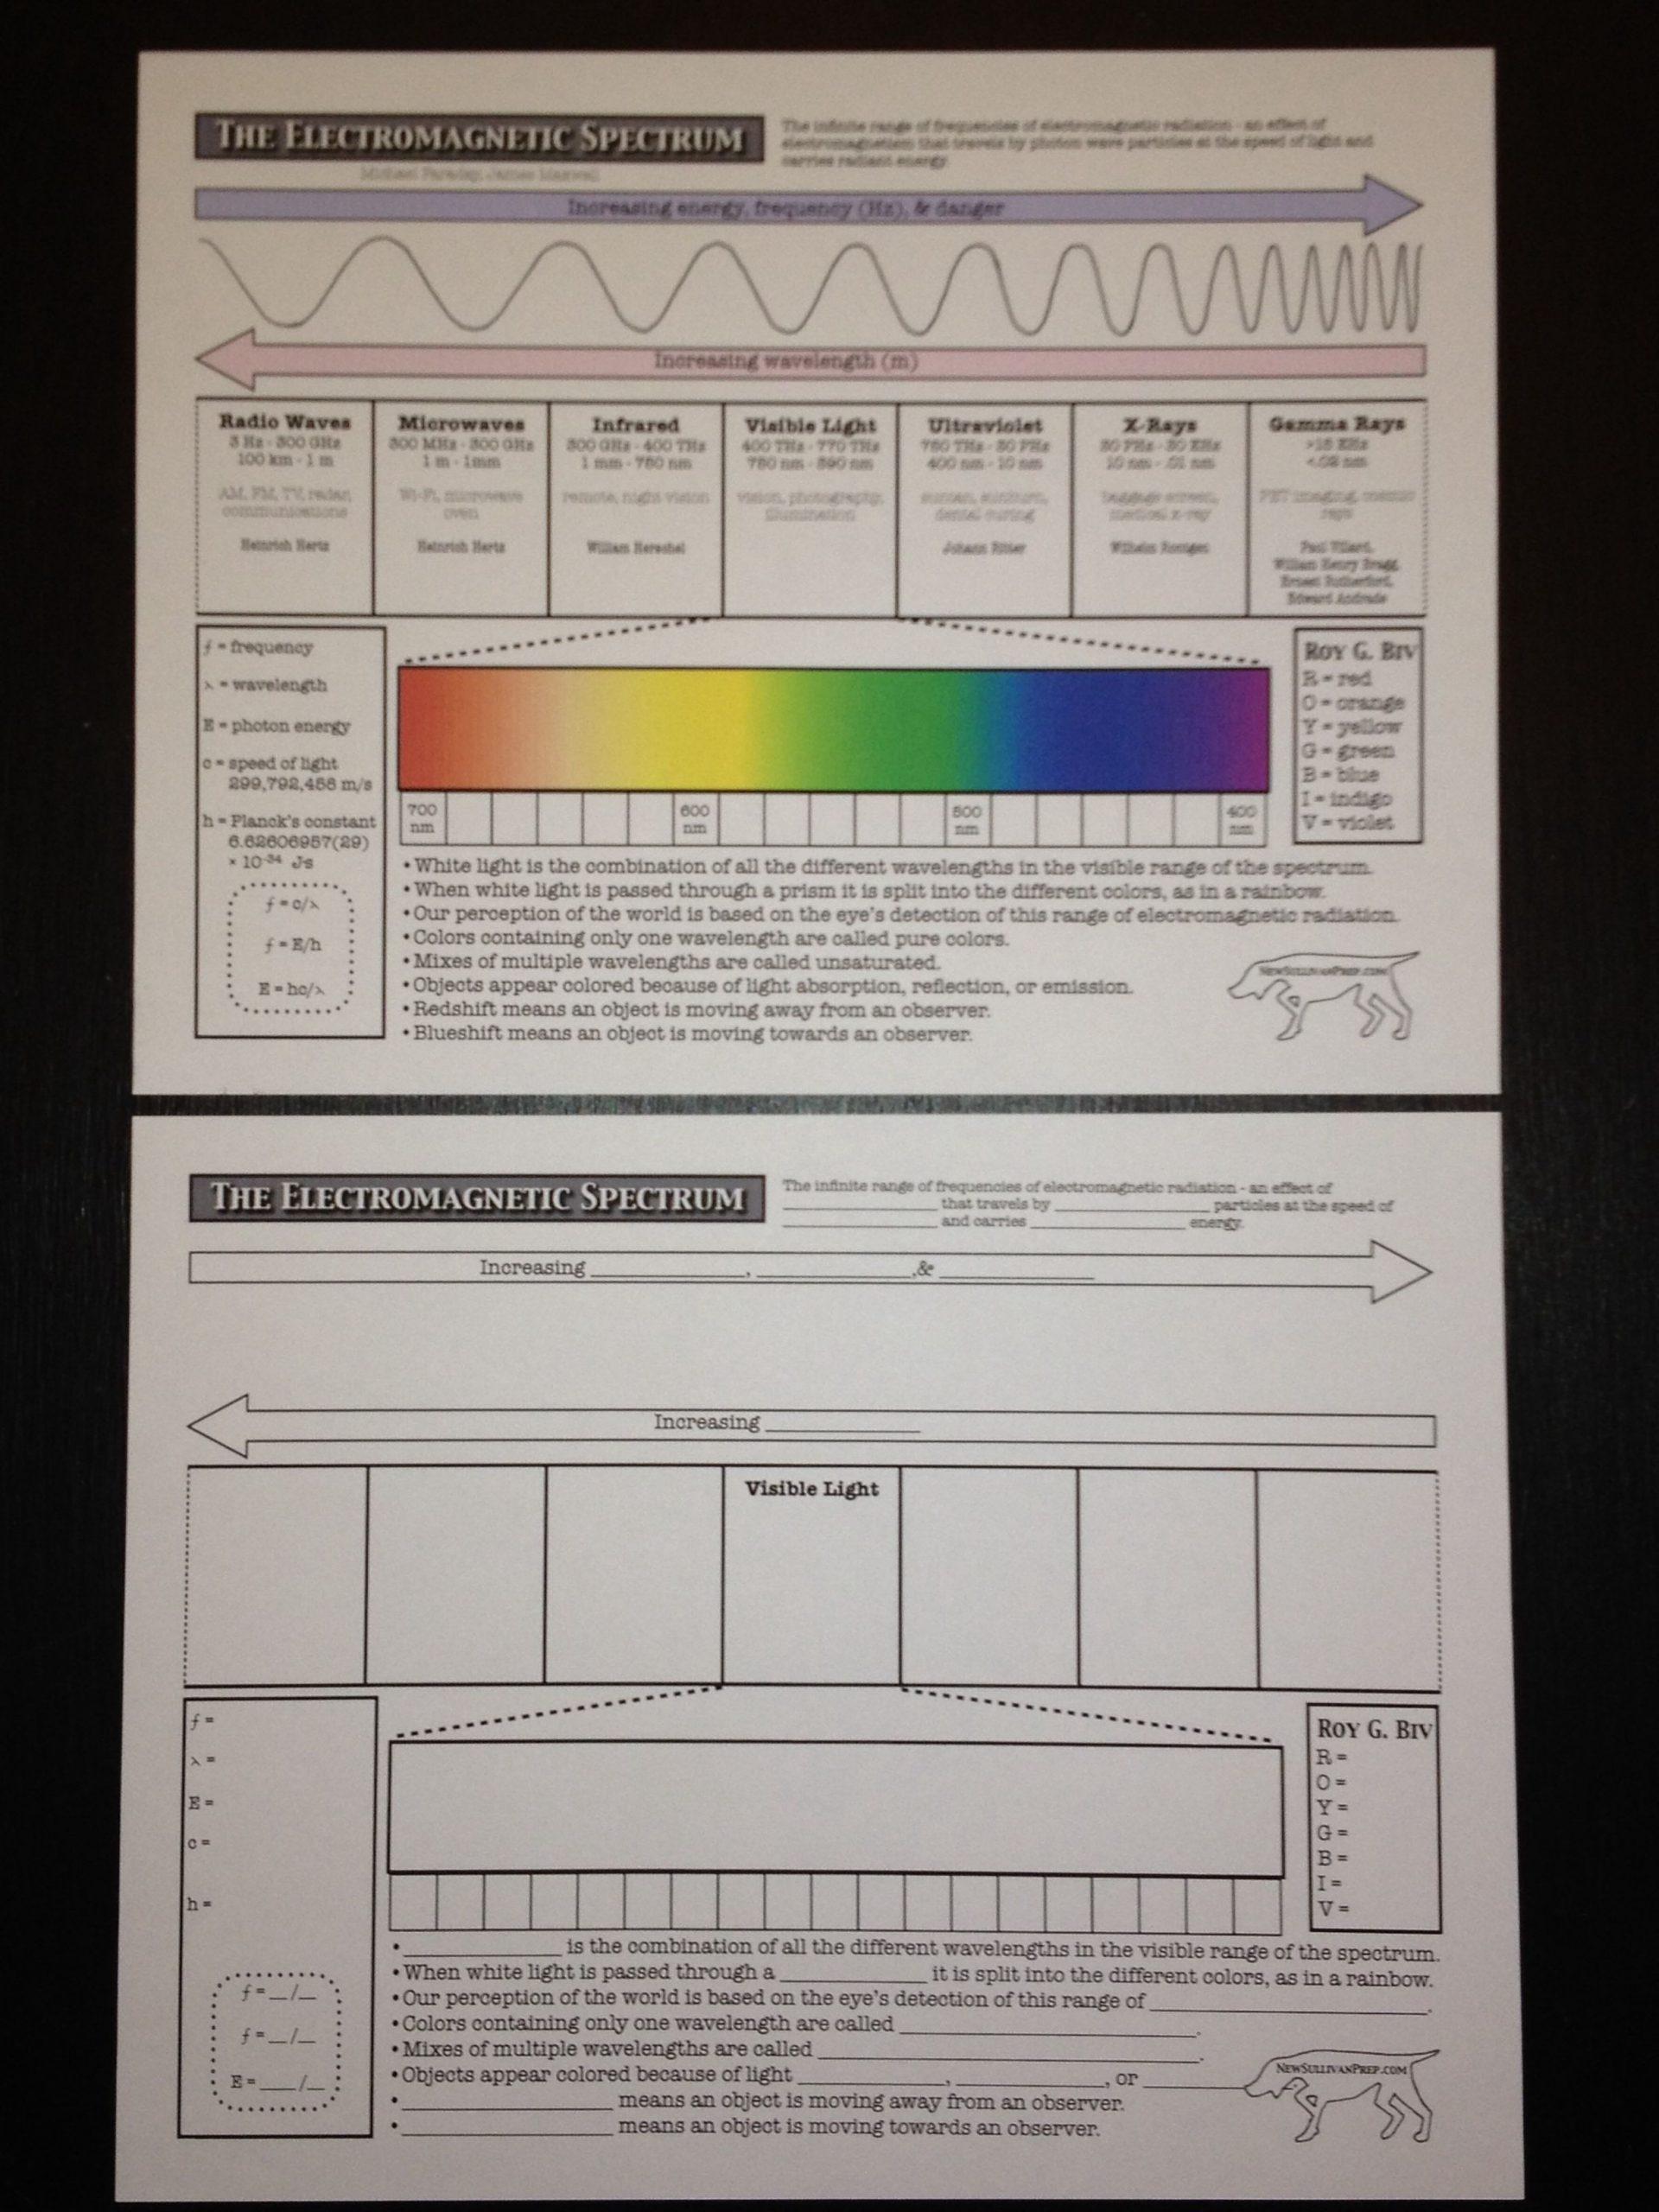 Electromagnetic Spectrum Worksheet Answers Free Electromagnetic Spectrum Worksheets Available at